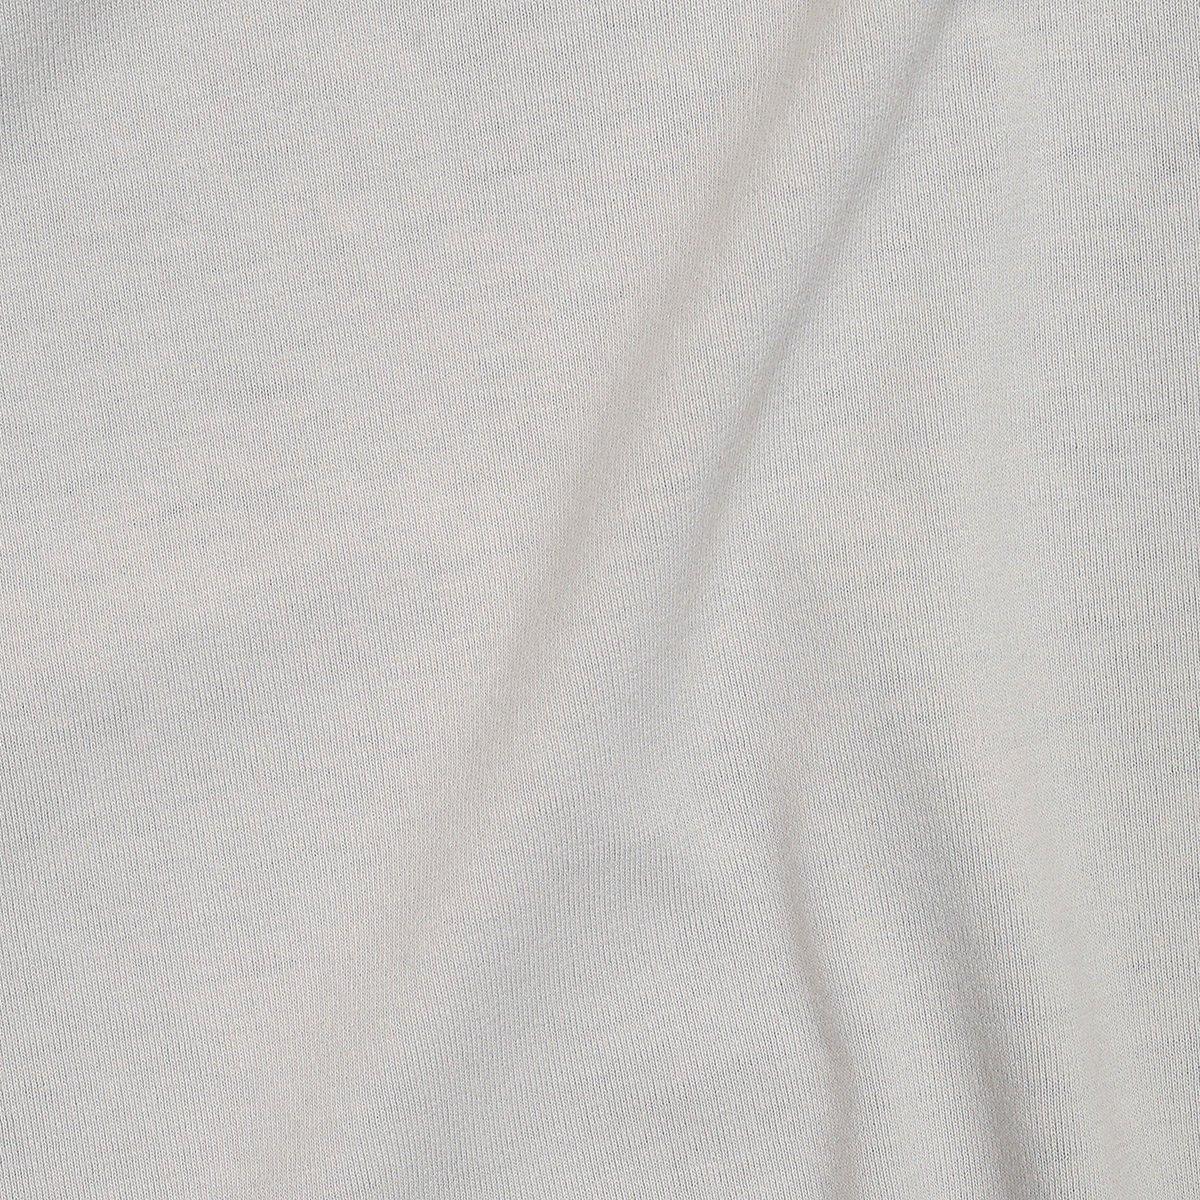 Short Sleeve RIB T-shirts 詳細画像25